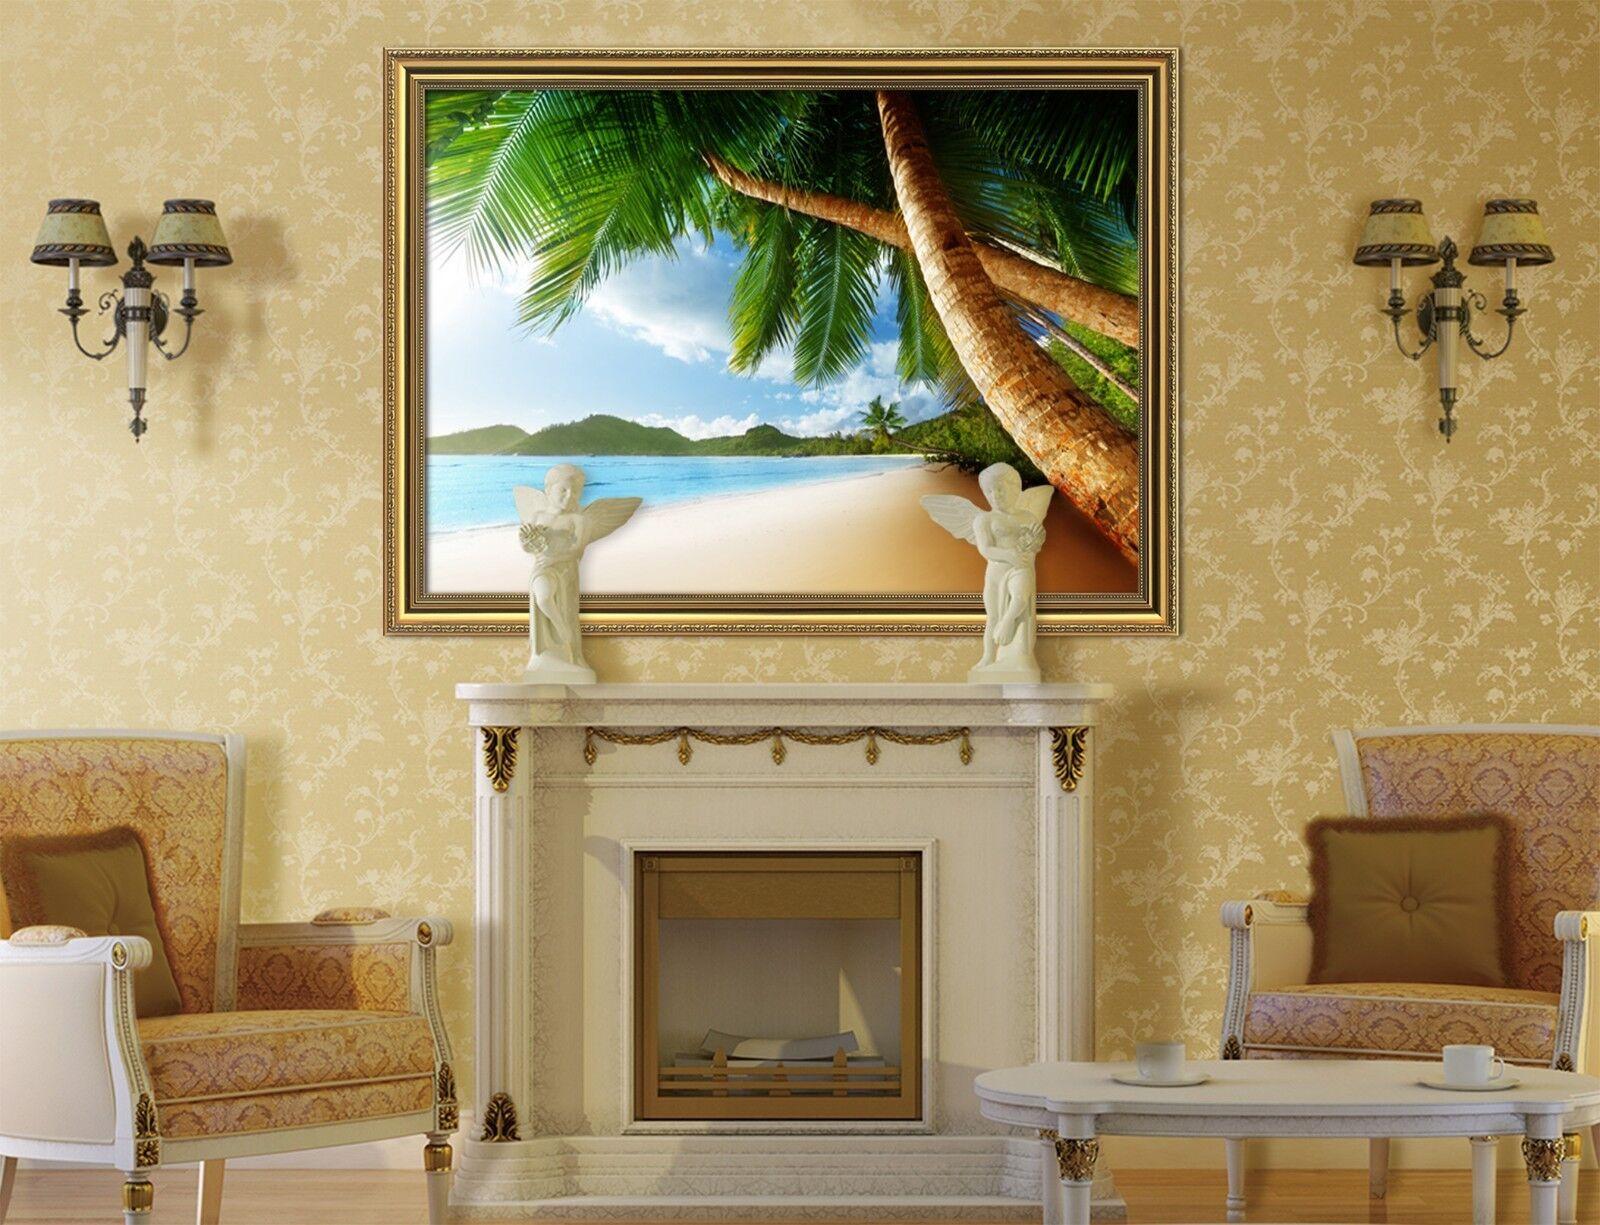 3D Palm Tree Beach 2 Framed Poster Home Decor Print Painting Art AJ WALLPAPER